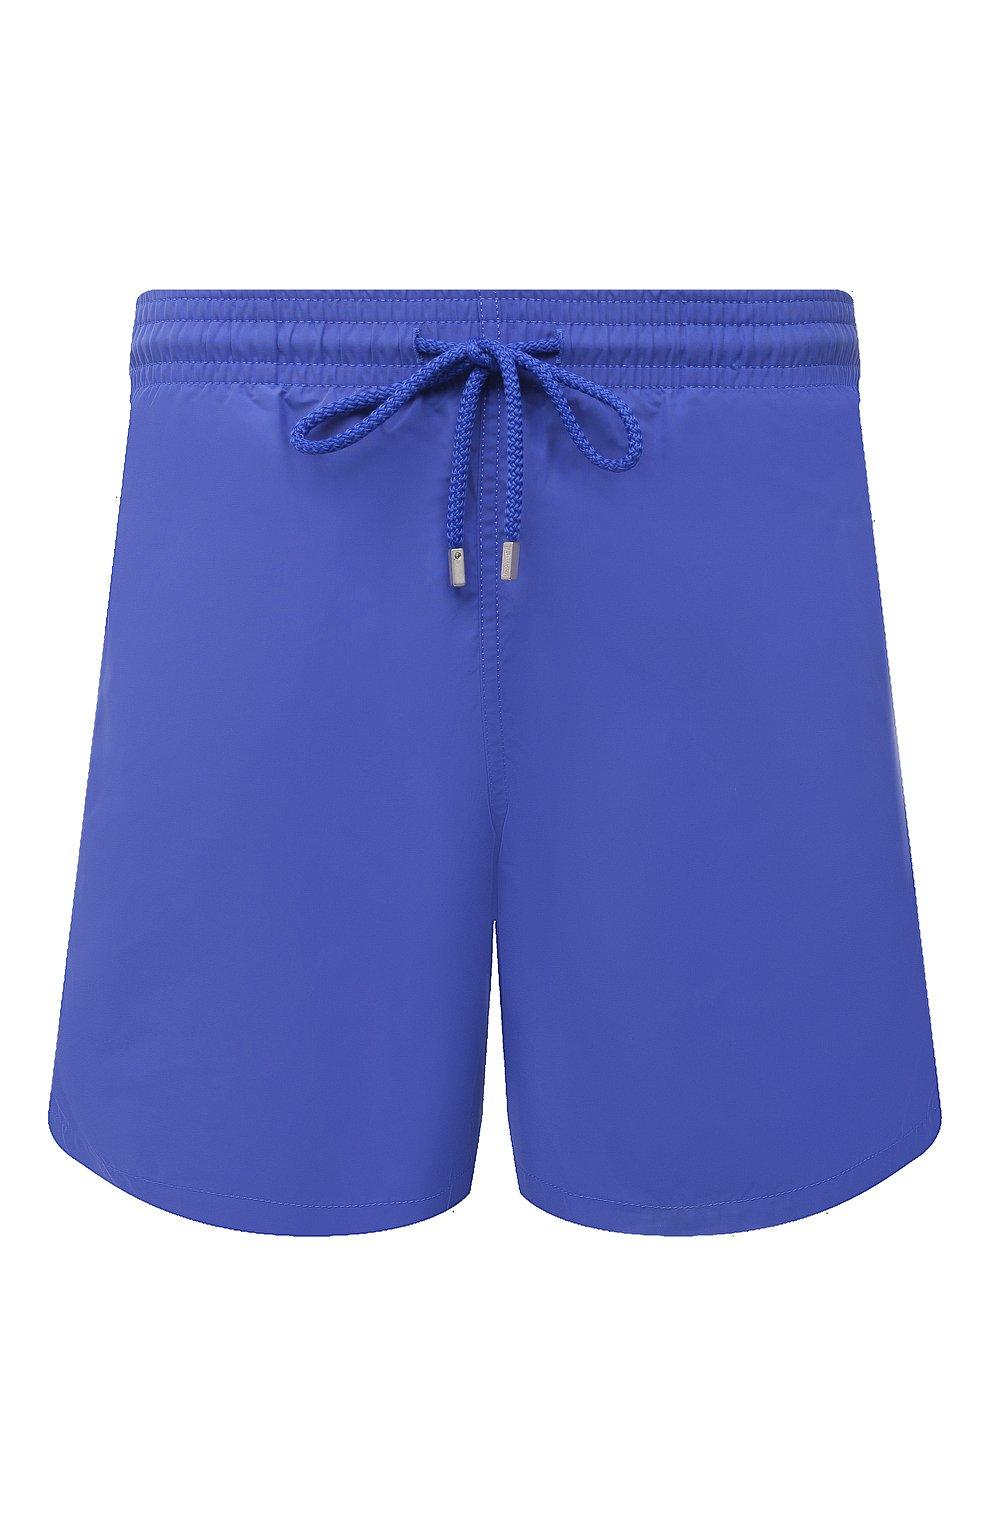 Мужские плавки-шорты VILEBREQUIN фиолетового цвета, арт. MOOC1A00/314 | Фото 1 (Принт: Без принта; Материал внешний: Синтетический материал)